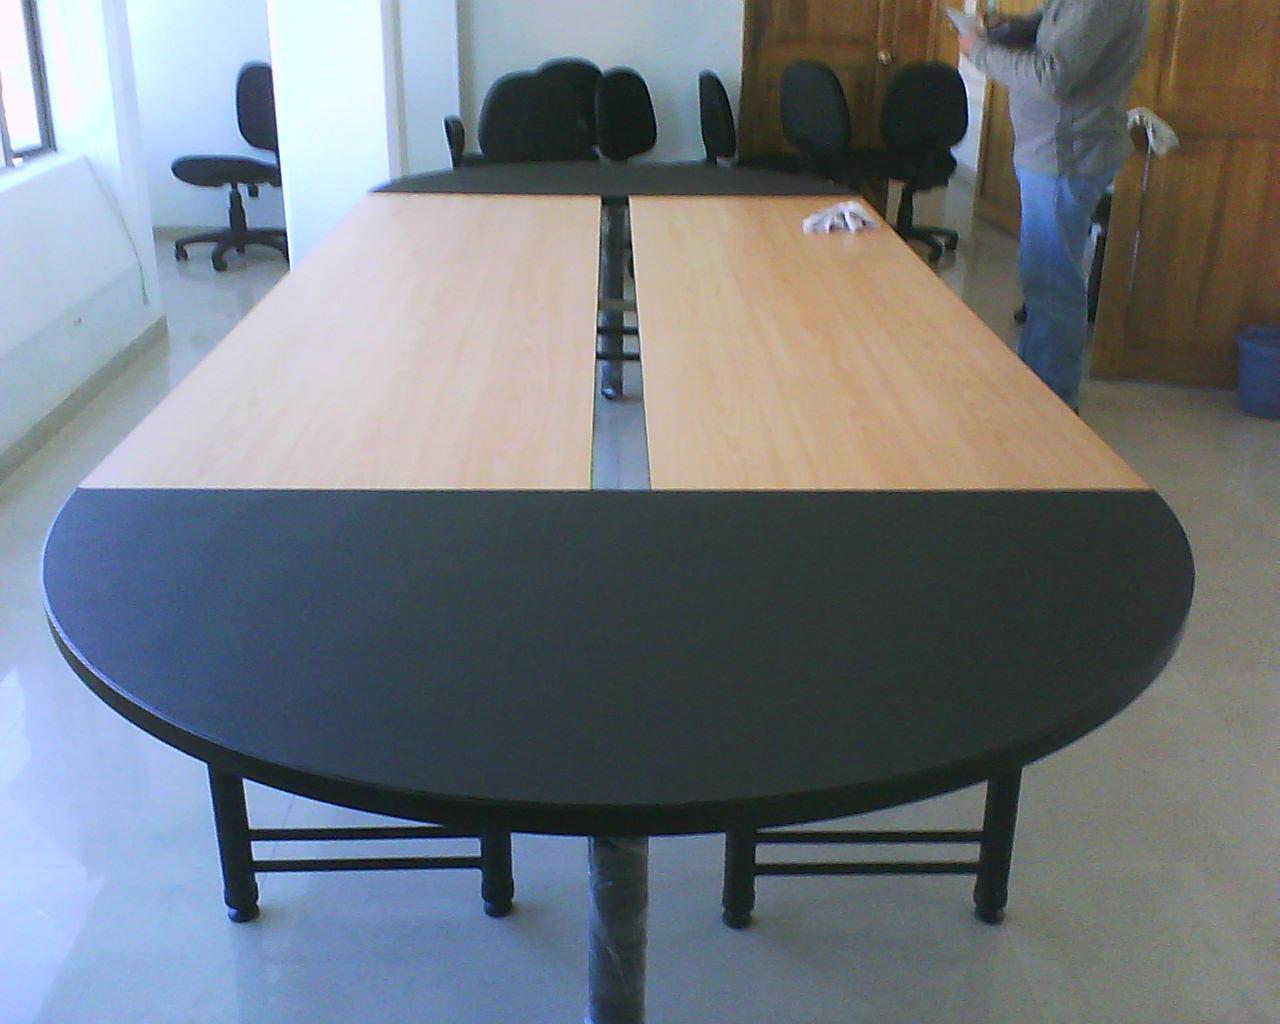 Alquiler de muebles para oficina office sistem ltda for Alquiler muebles oficina